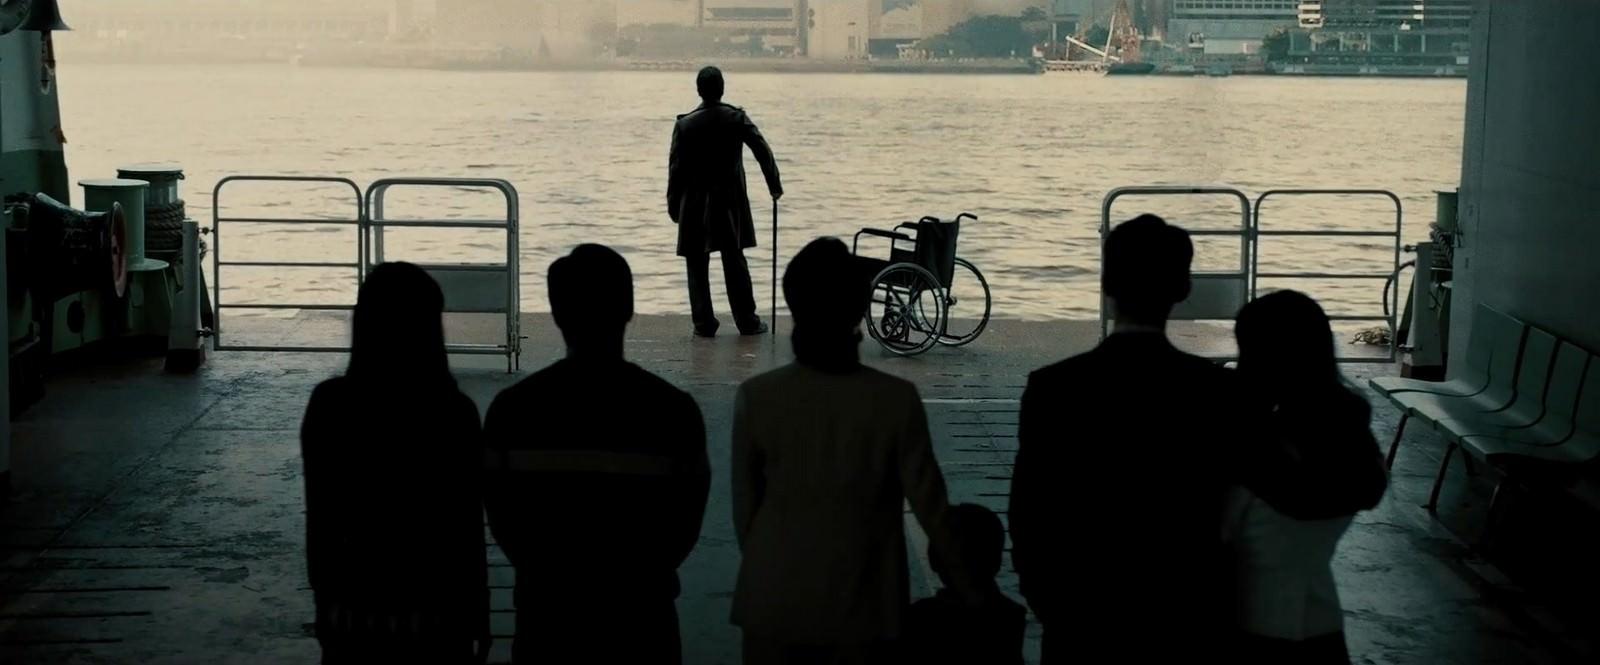 Movie, 追龍(香港, 2017年) / 追龍(台灣) / 追龙(中國) / Chasing the Dragon(英文), 片尾劇情